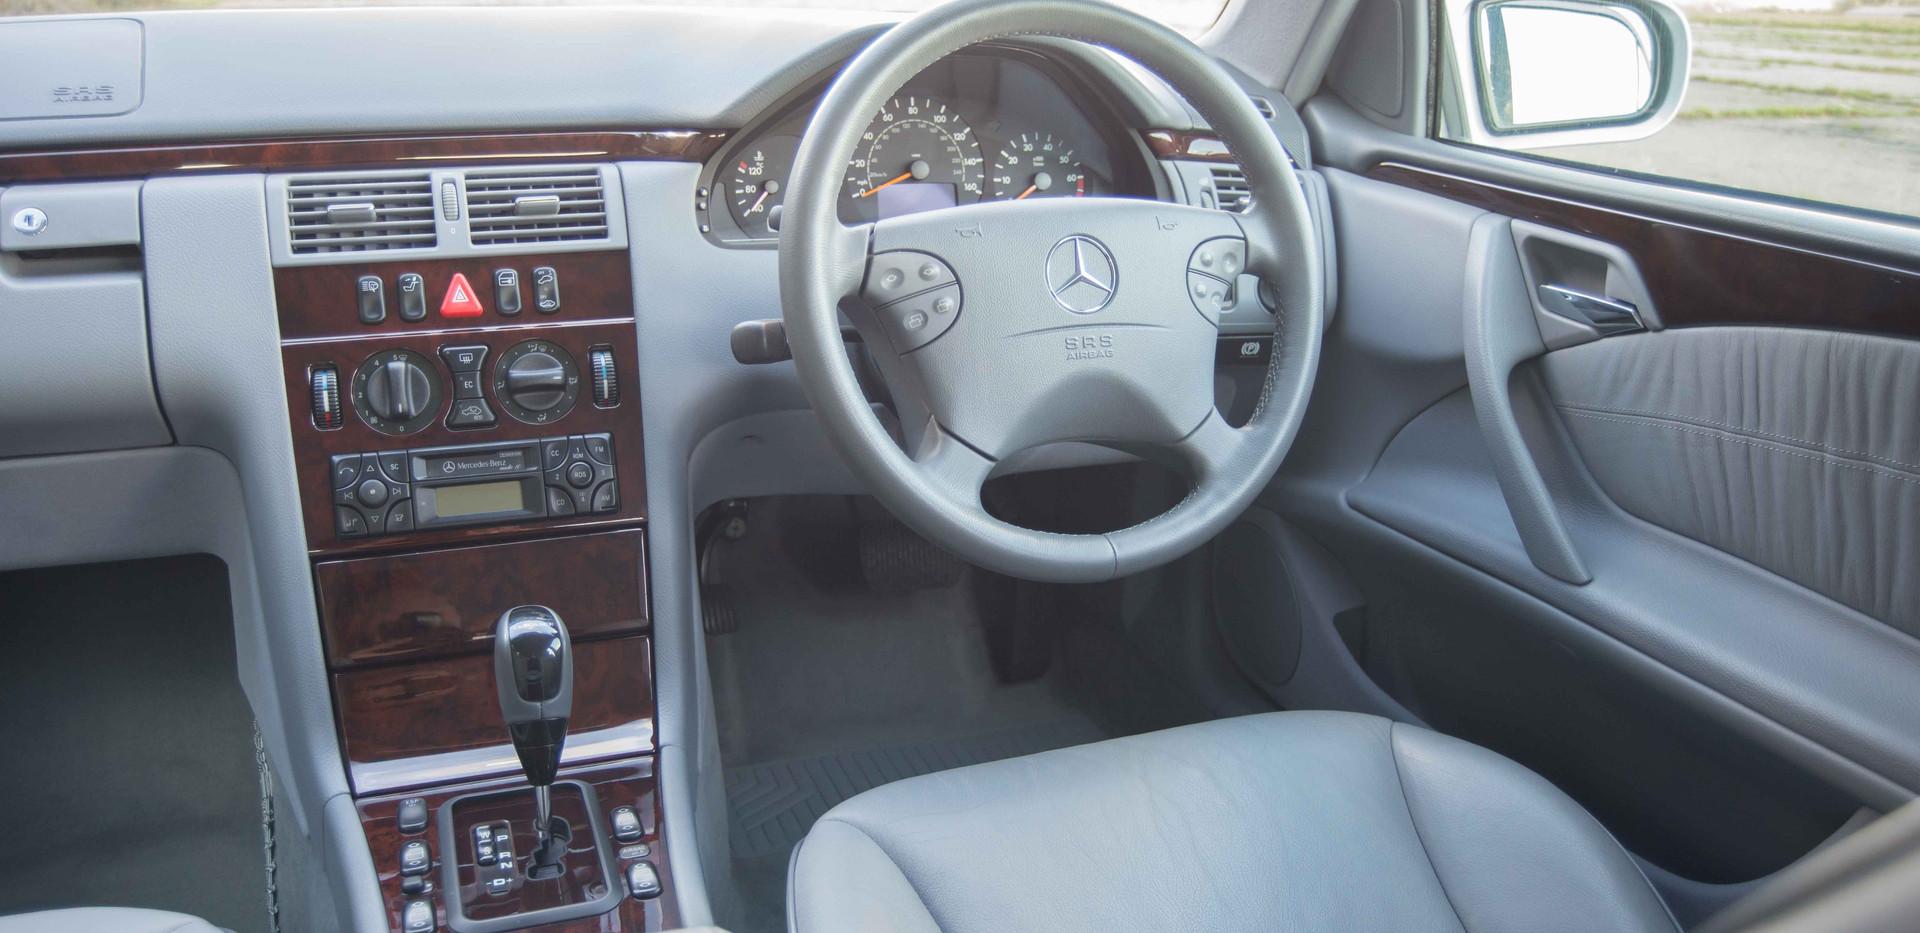 Mercedes E240 For Sale UK London  (61 of